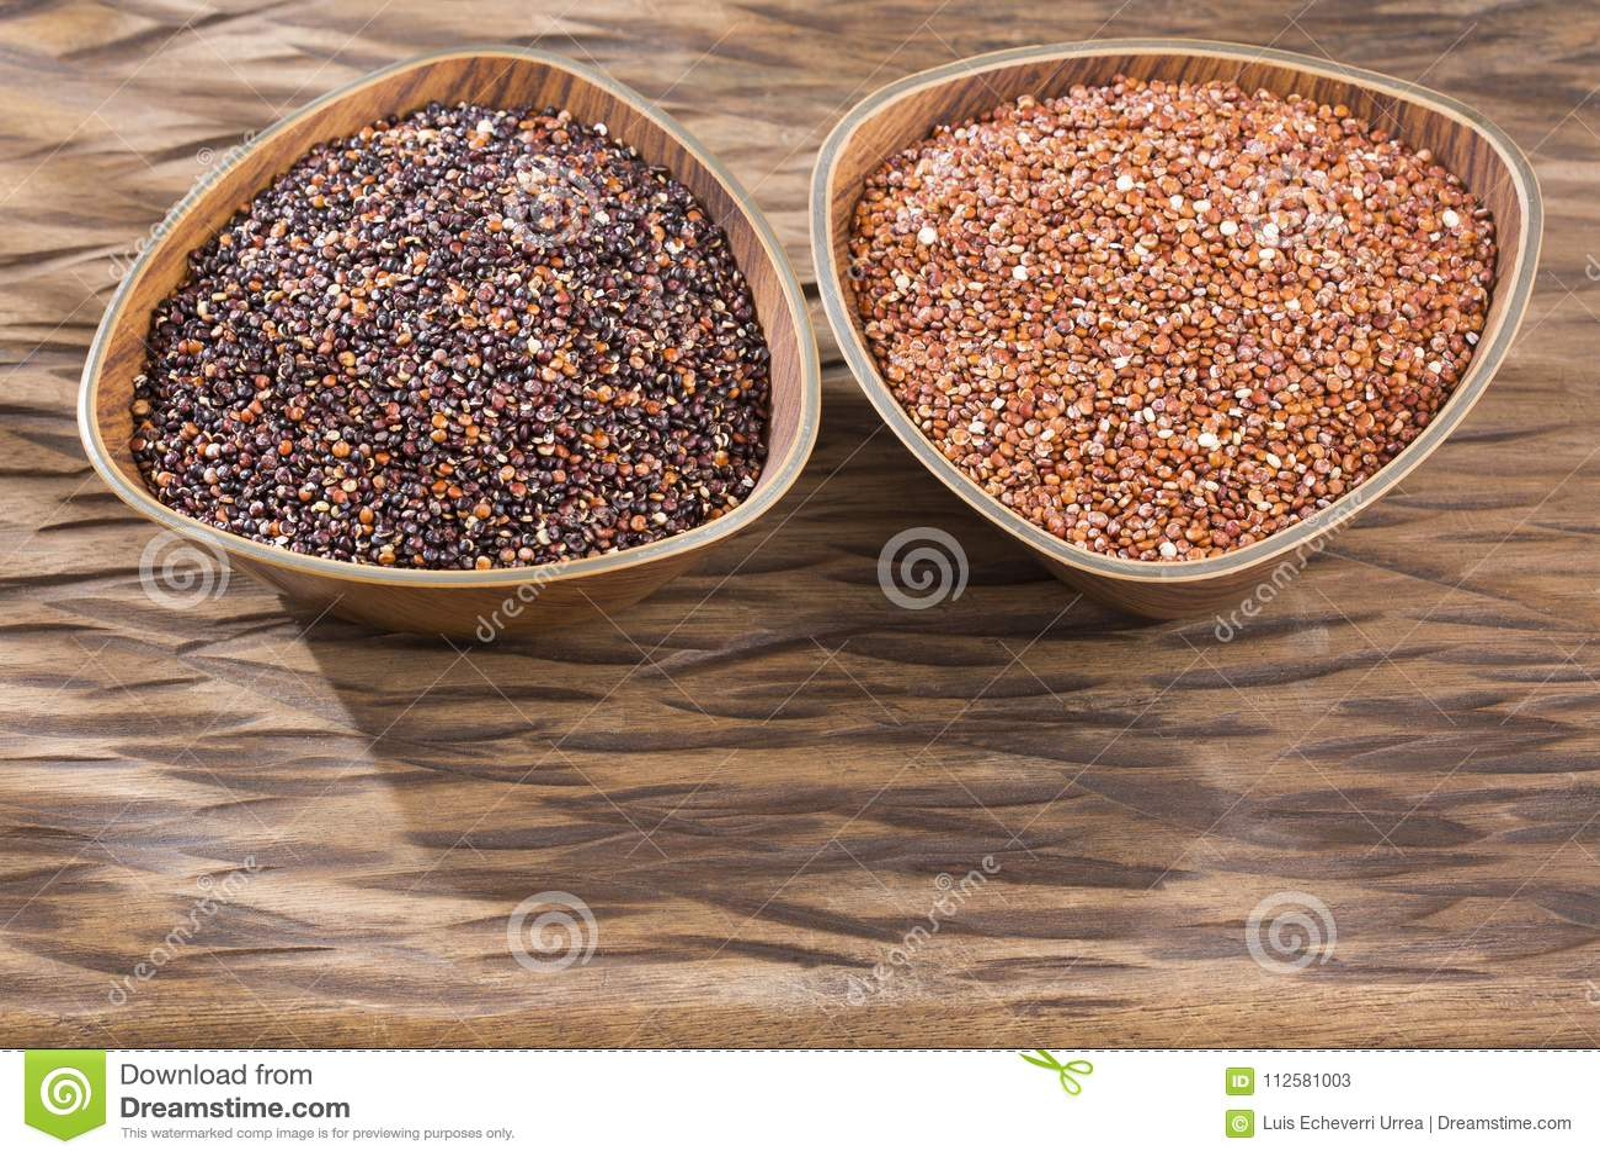 Black Quinoa seeds 1 g non GMO Doohov seeds